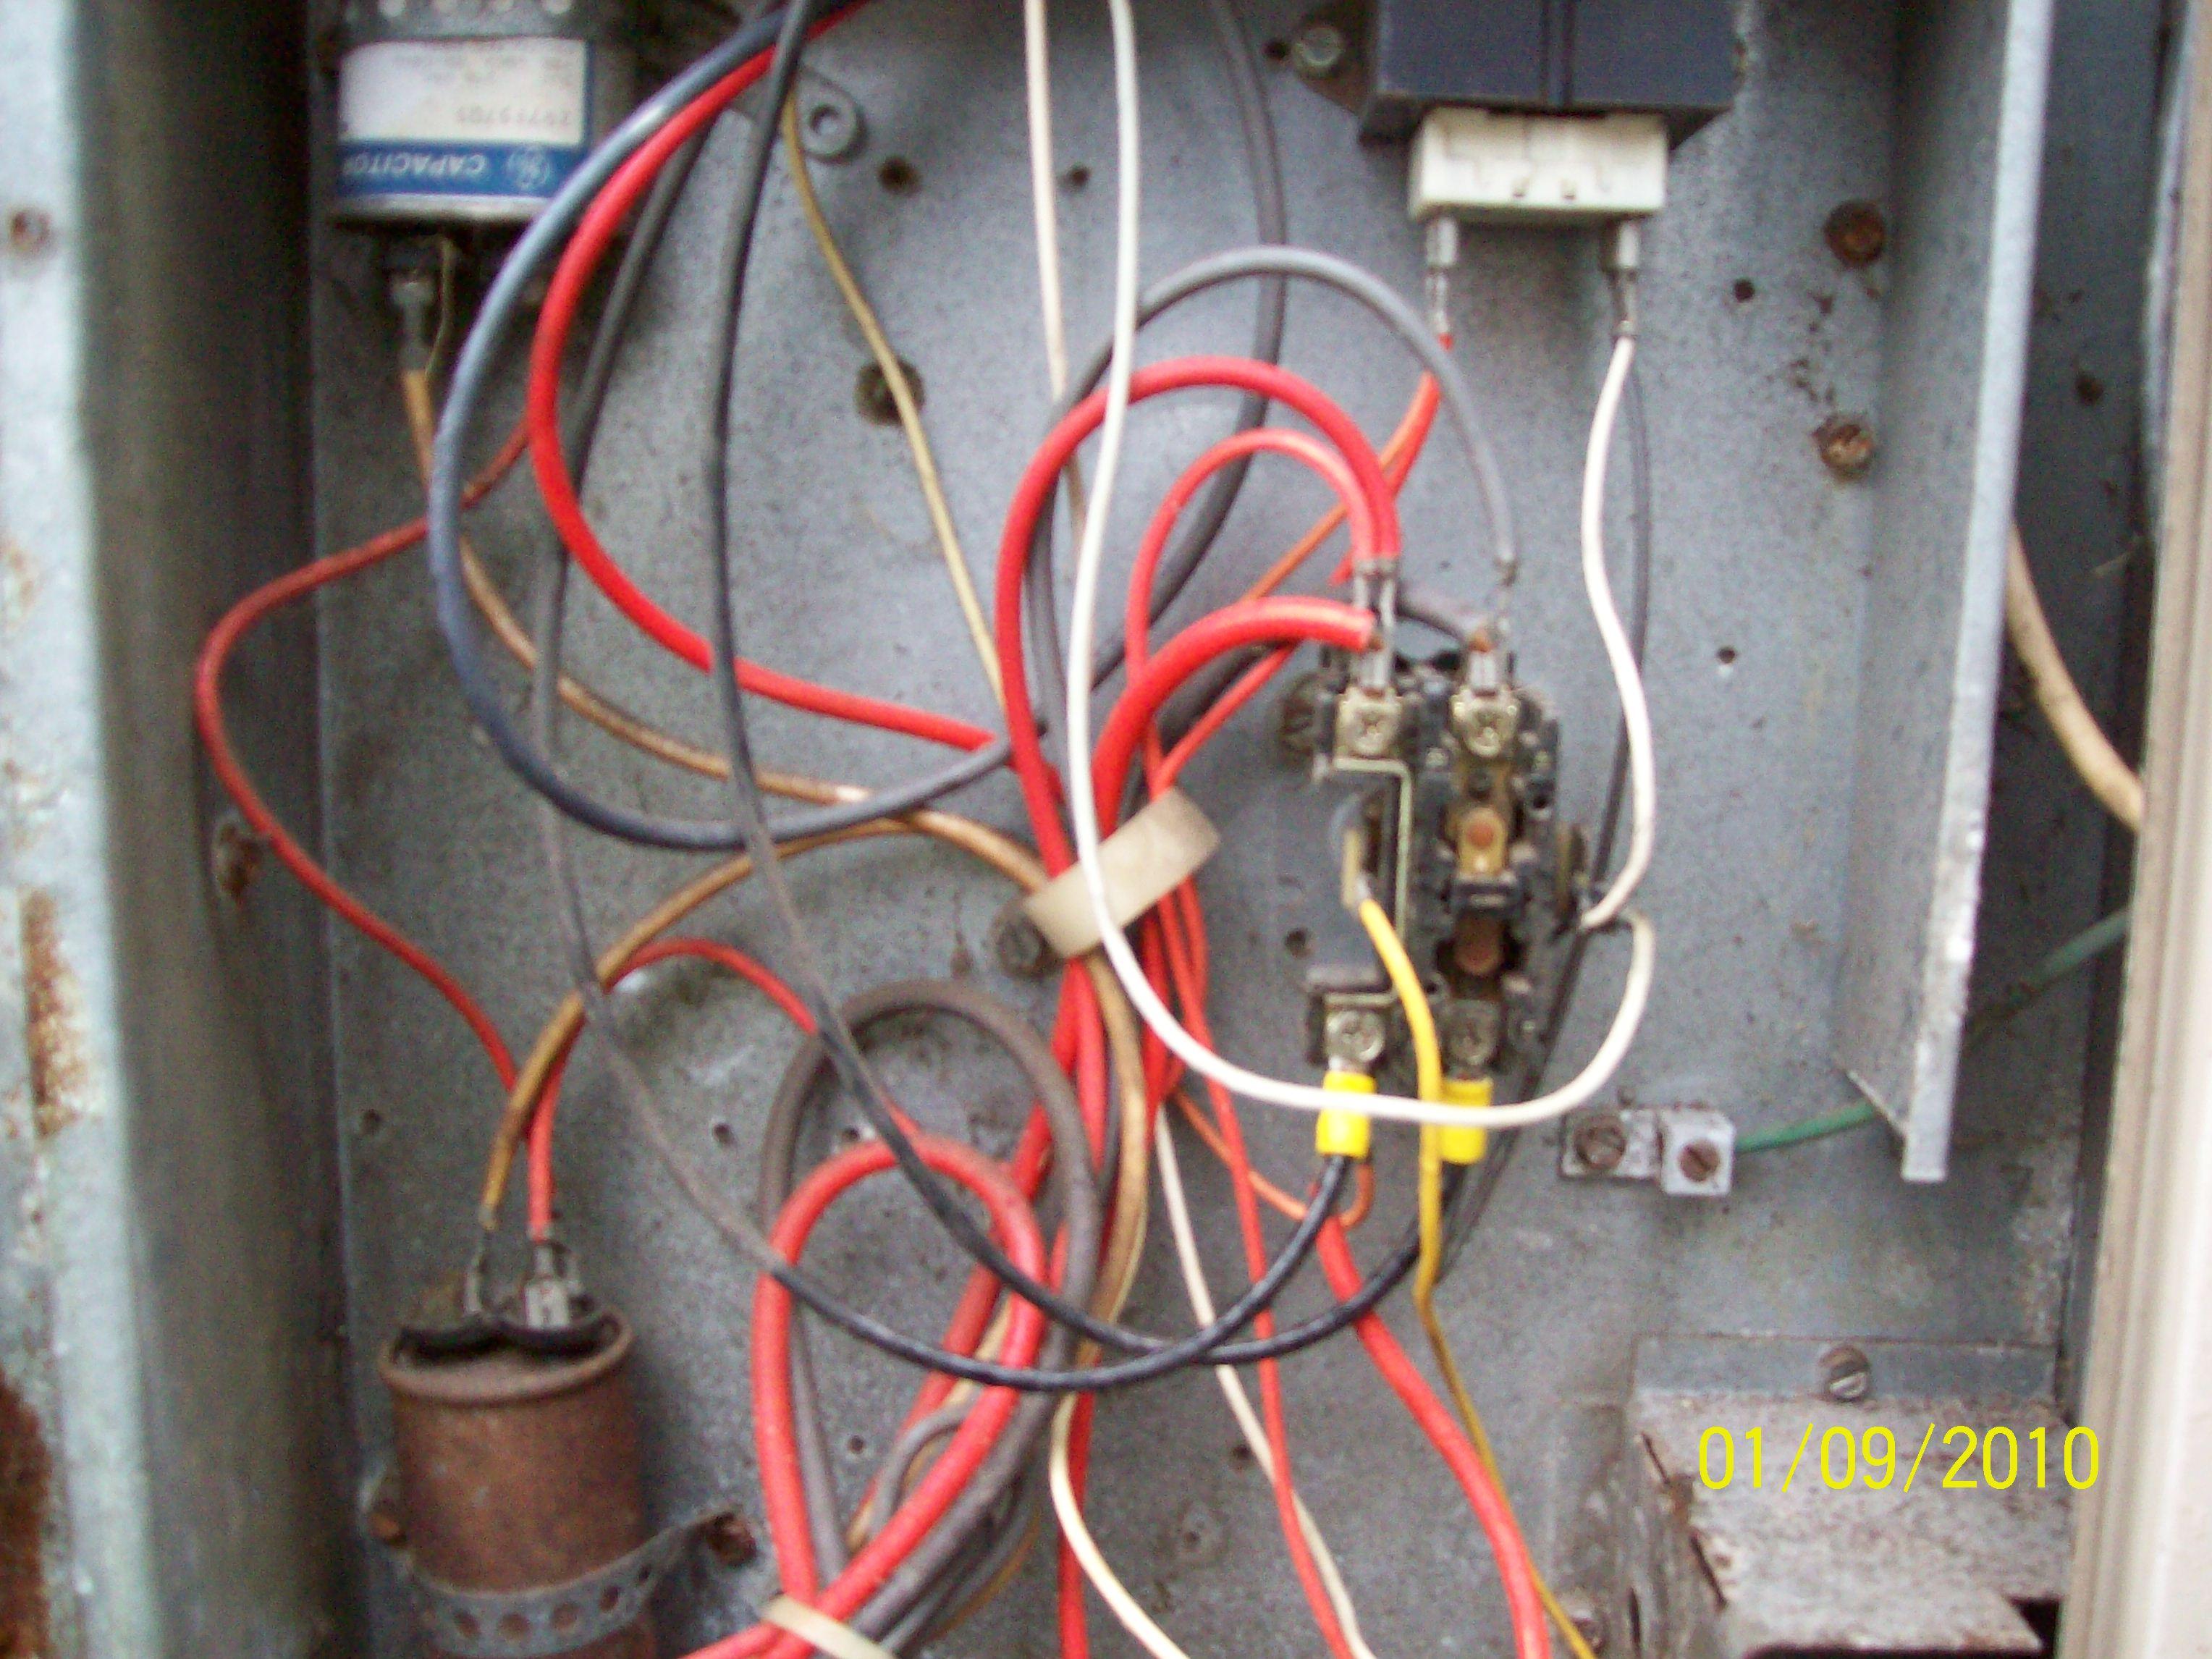 I Have No Voltage To The Heat Strips On A Coleman  Evcon Model No  Bpch 0361 Ba  Serial No